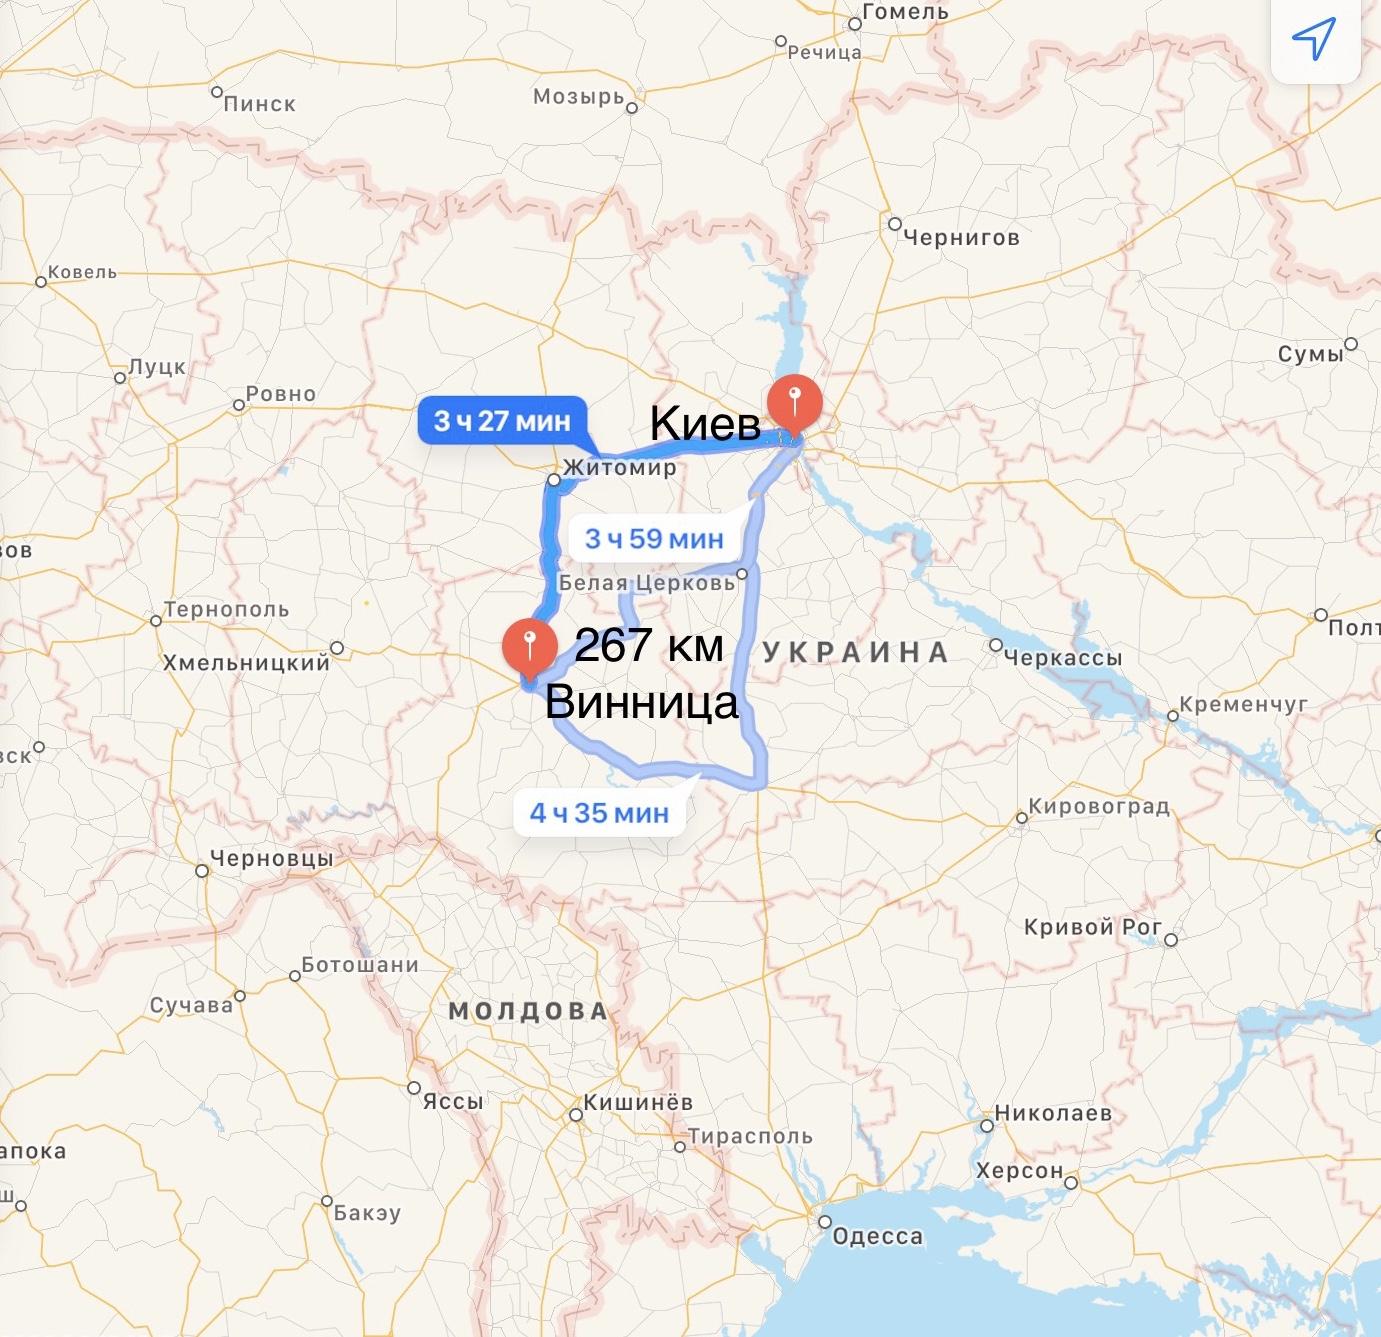 Грузоперевозки Киев – Винница